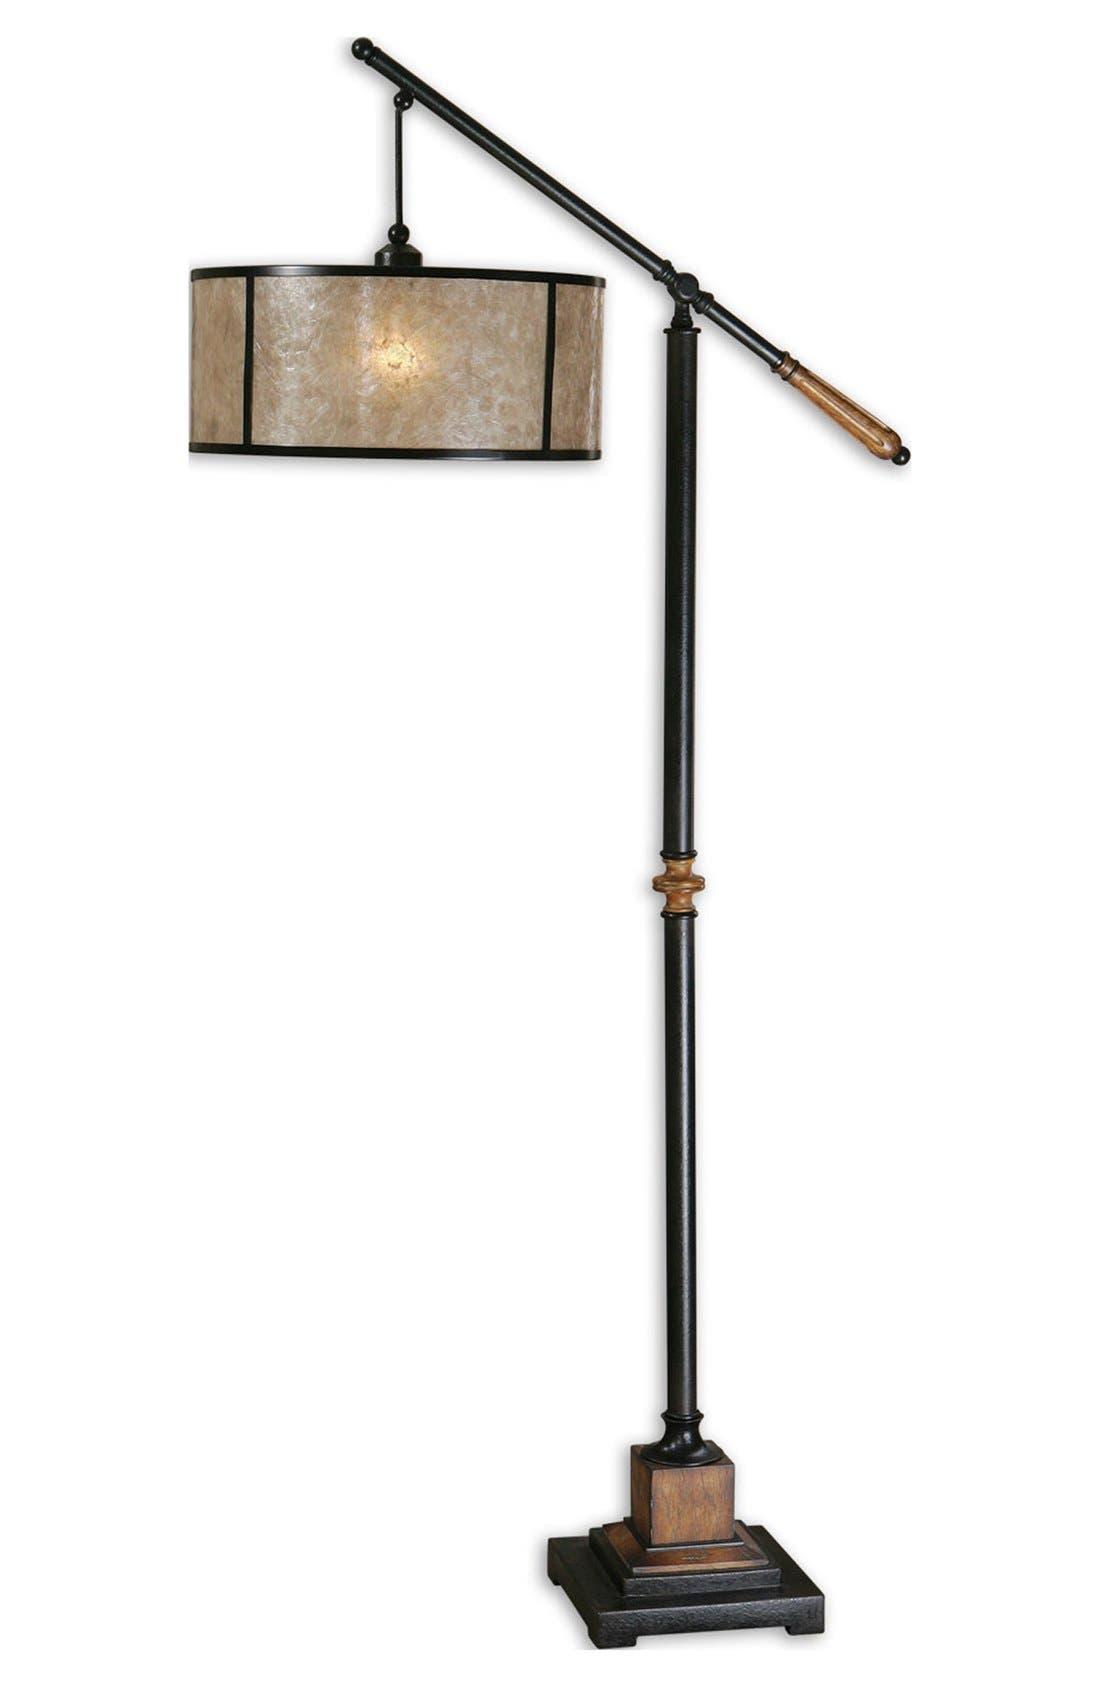 Main Image - Uttermost 'Sitka' Lantern Floor Lamp